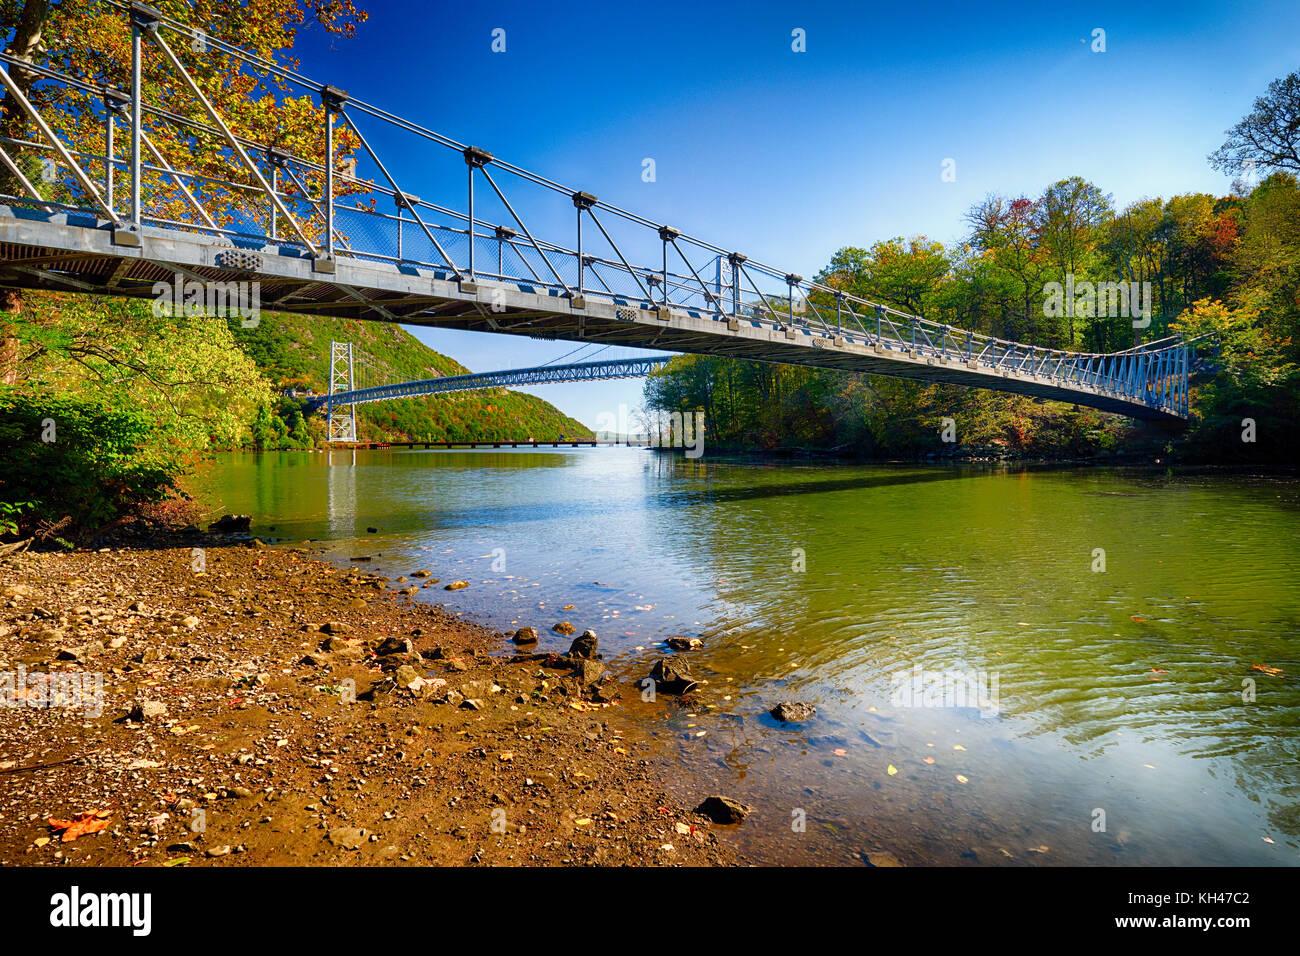 View of Two Bridges, Bear Mountain Bridge and The Popolepen Creek Footbridge, Ft. Montgomery, New York - Stock Image